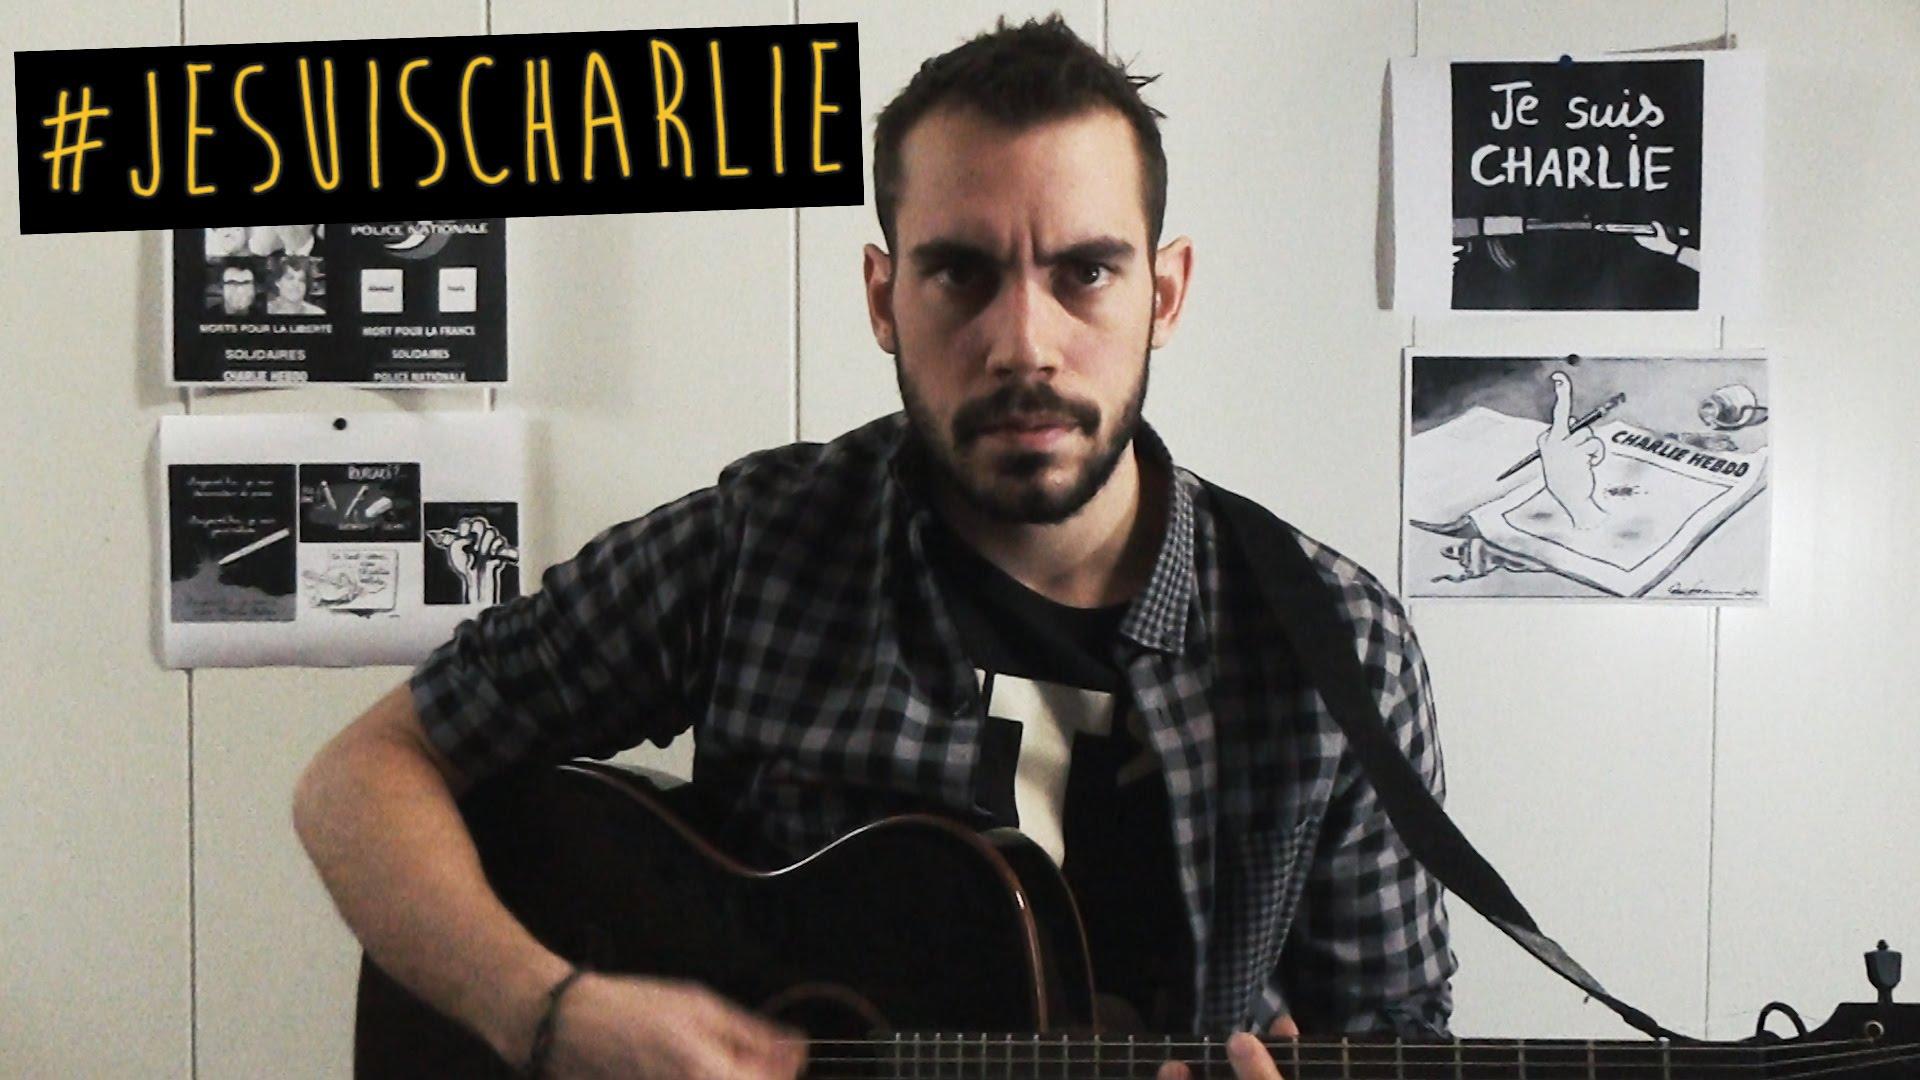 JB Bullet – #JeSuisCharlie